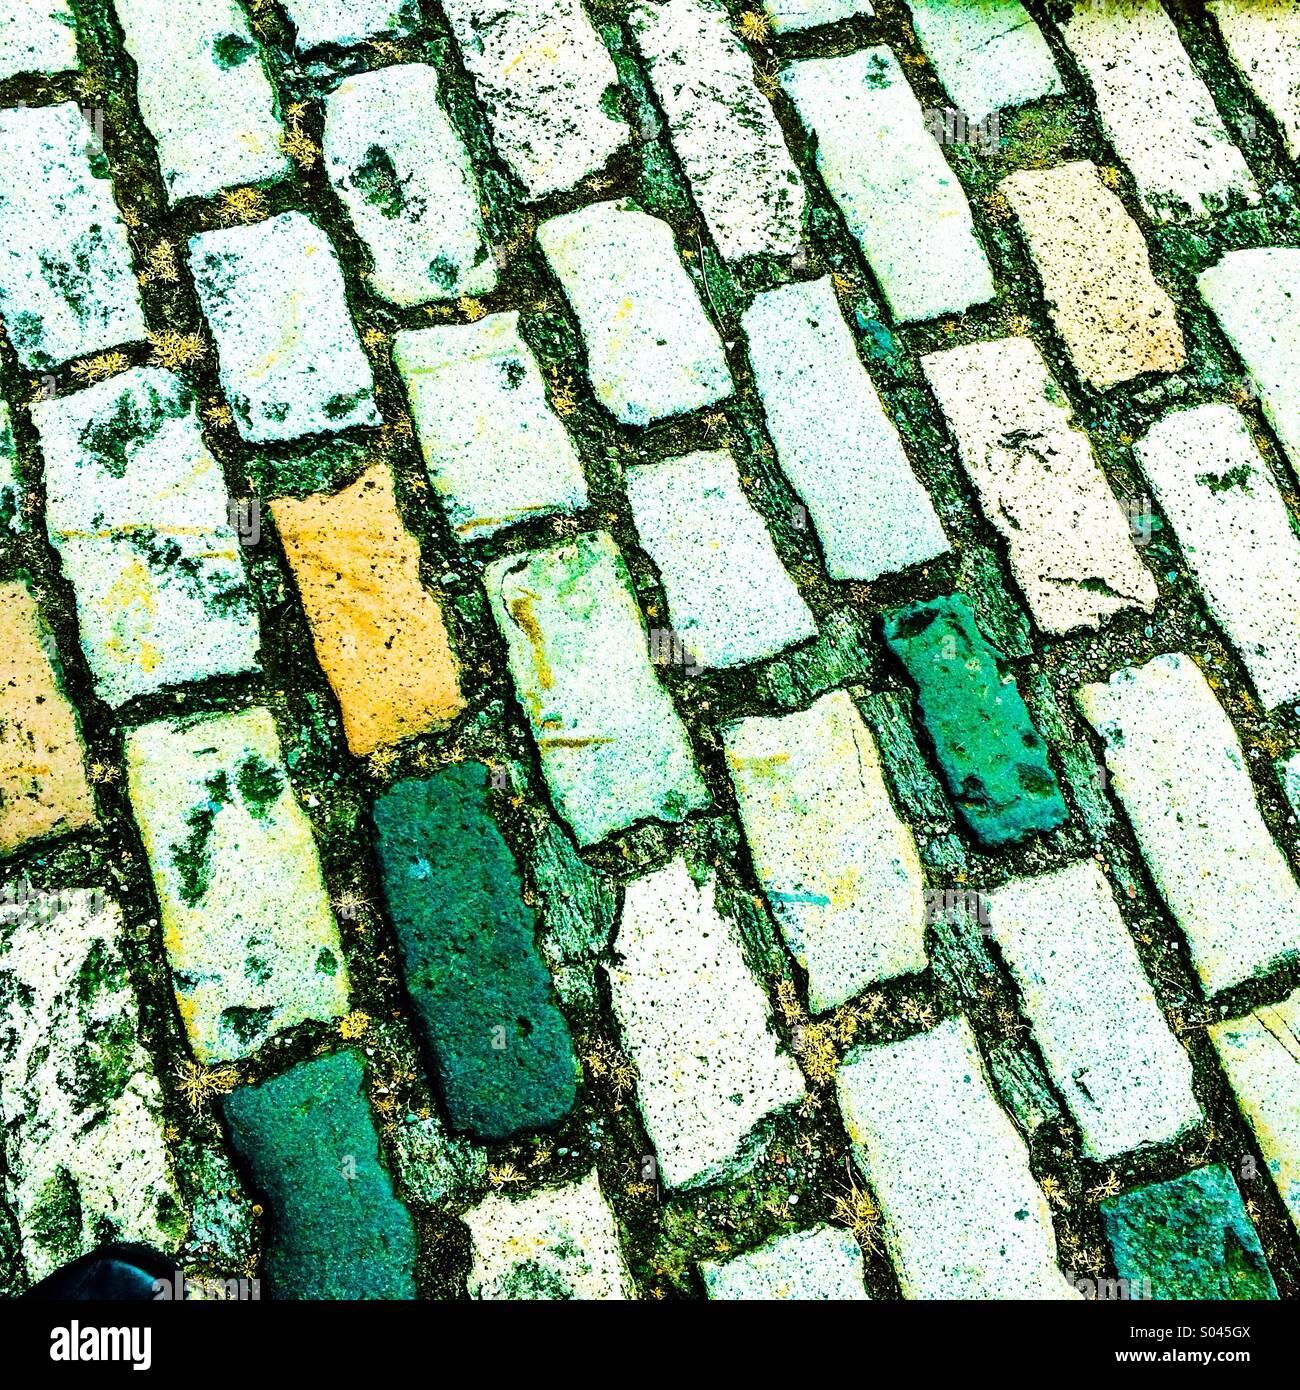 Green brick road - Stock Image